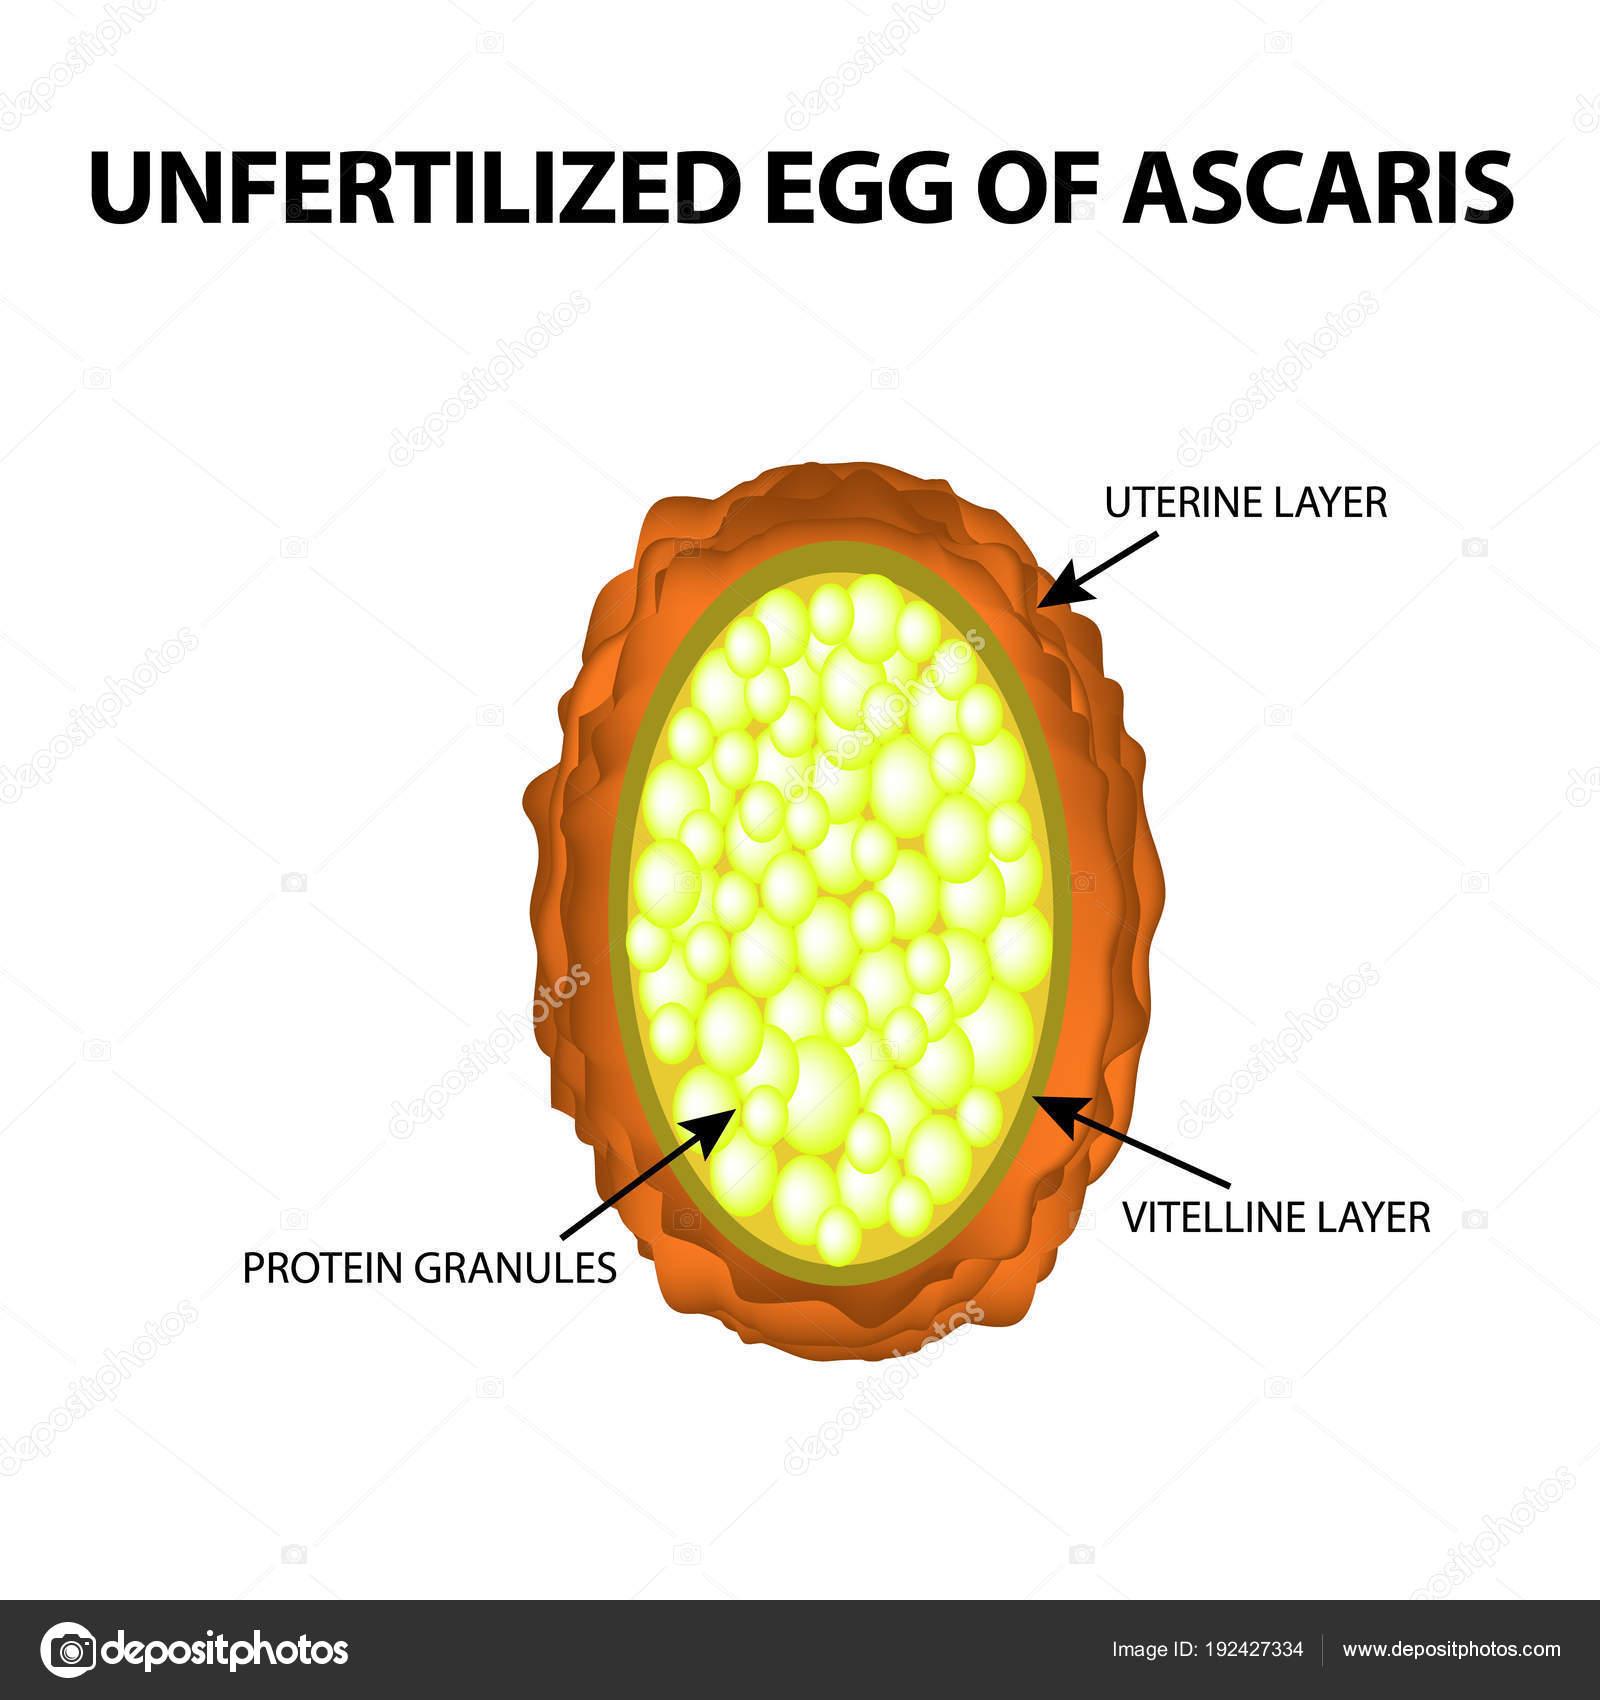 Ascaris tojás